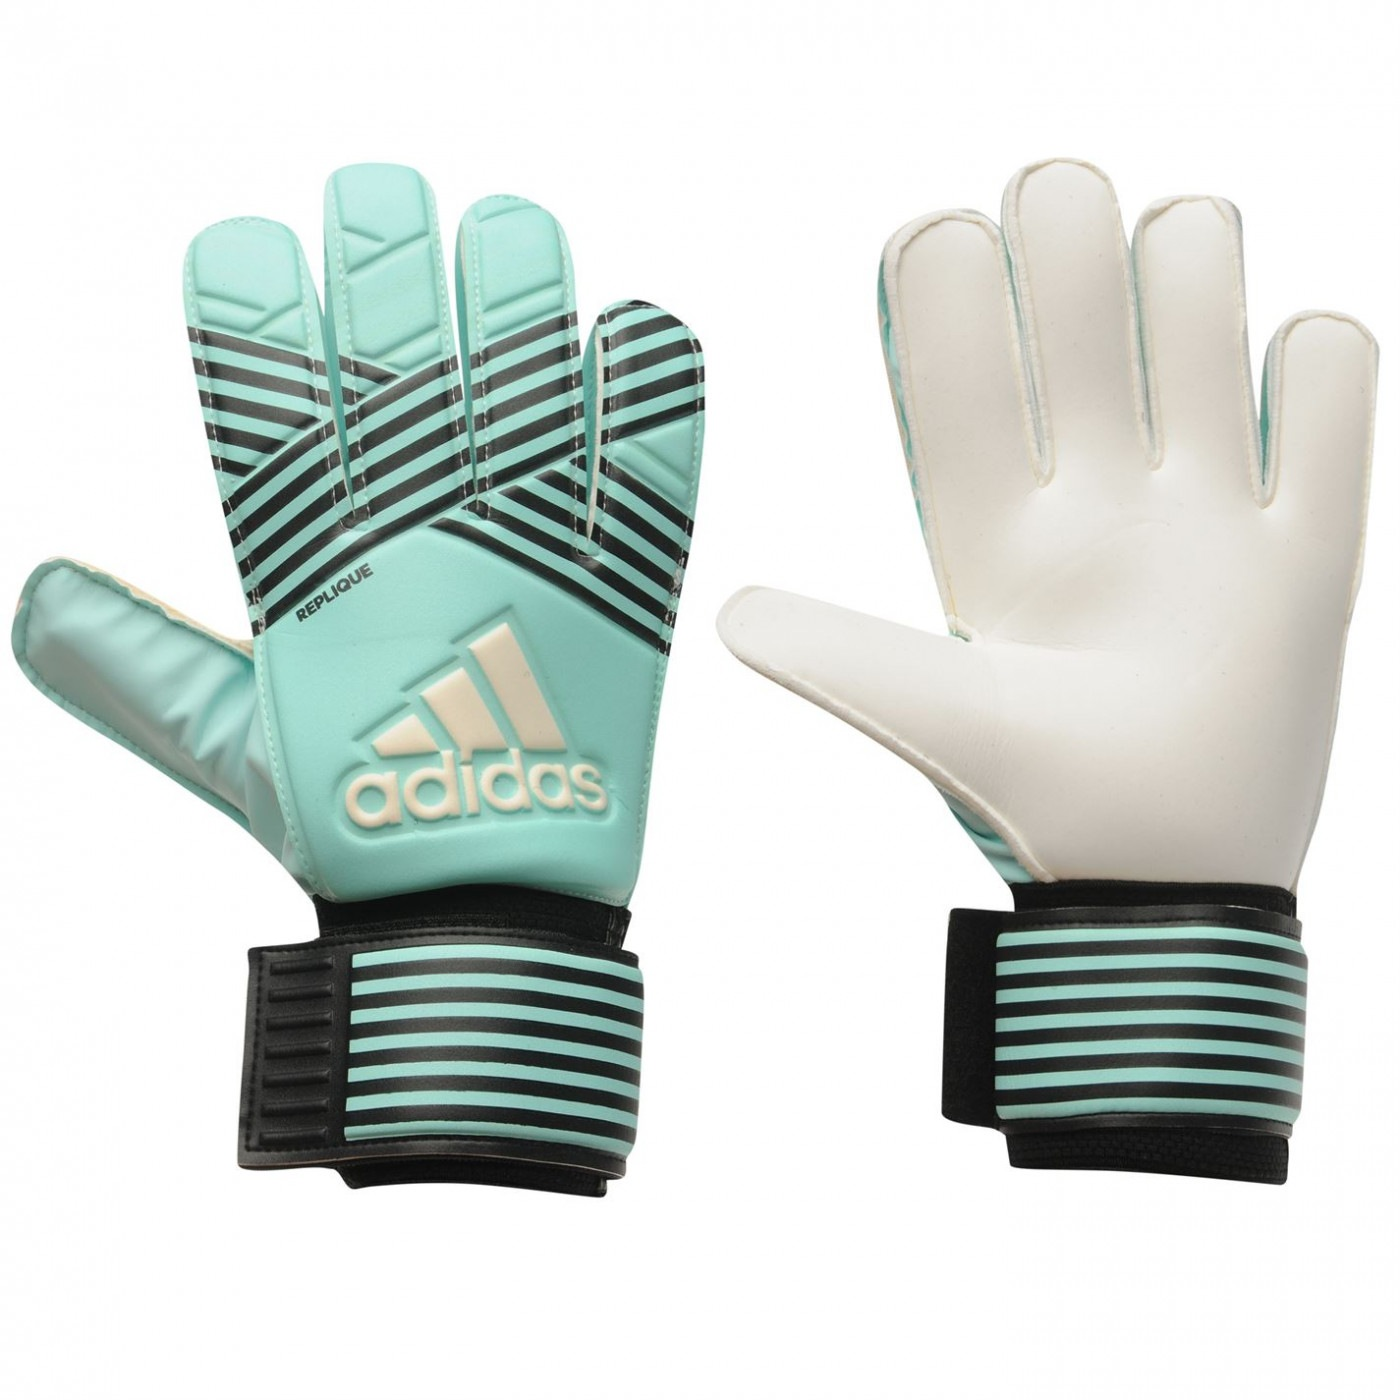 Adidas Ace Replique Goalkeeper Gloves Mens